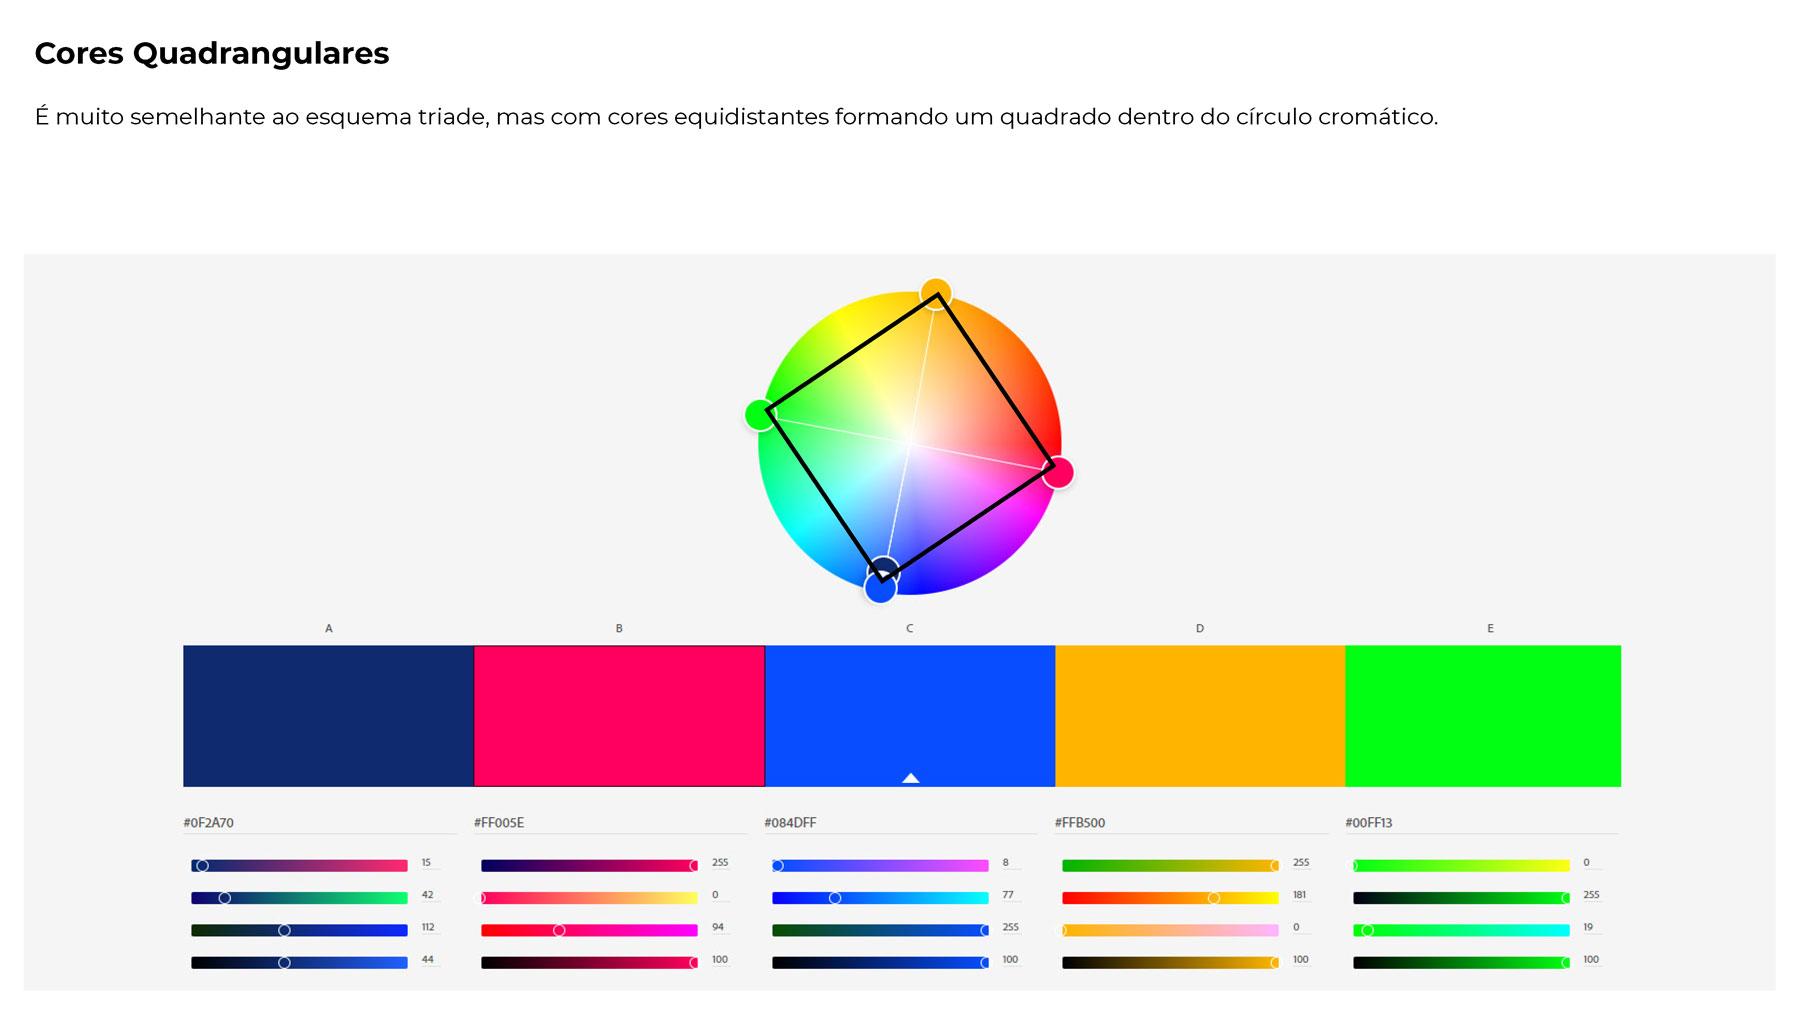 [淘宝购买] 300款色彩亮丽蒸汽波风动画绘画色板色轮模板素材 300 Color Swatches For Adobe Illustrator & Adobe Photoshop插图(20)